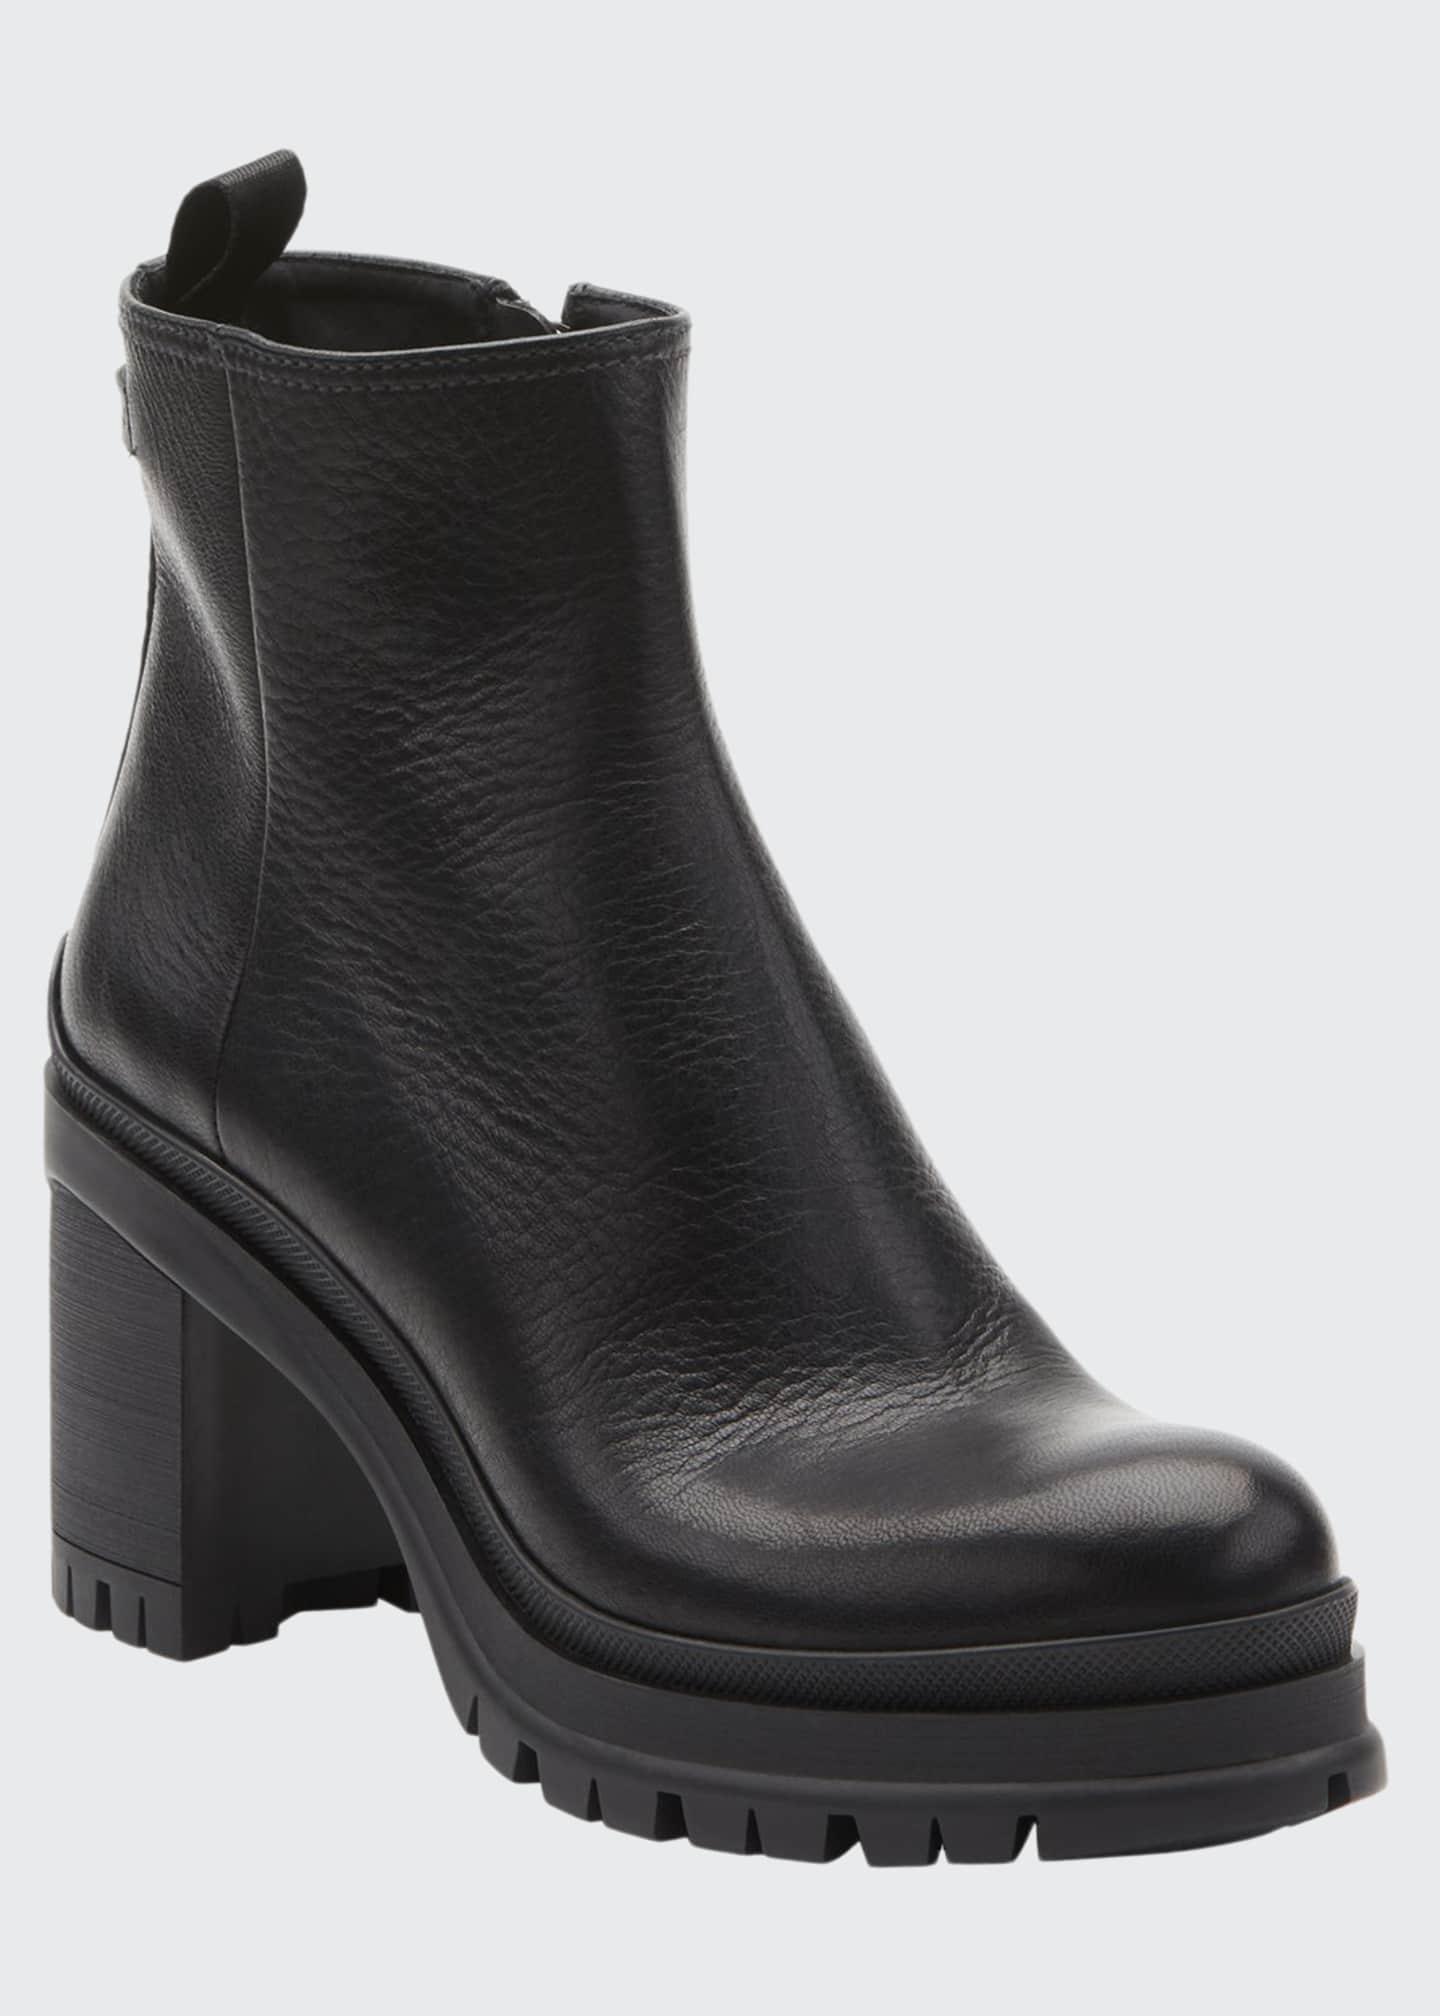 Prada Cervo Lugged Boots